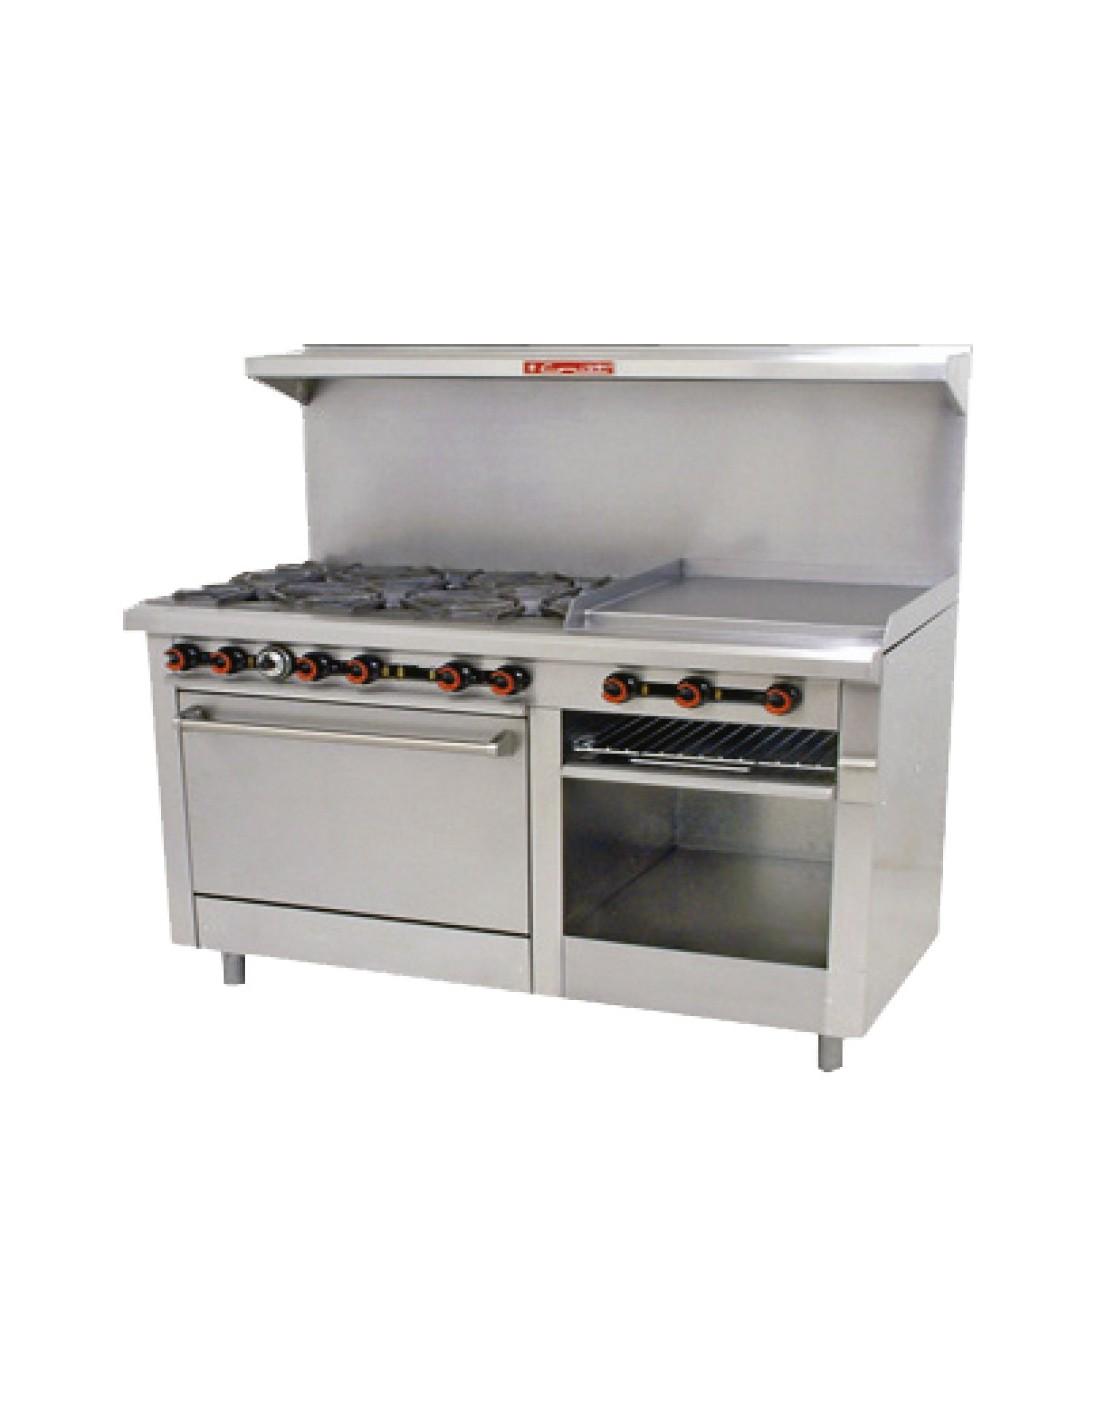 utensilios cocina industrial coriat estufa comercial de gas con horno 6 quemadores